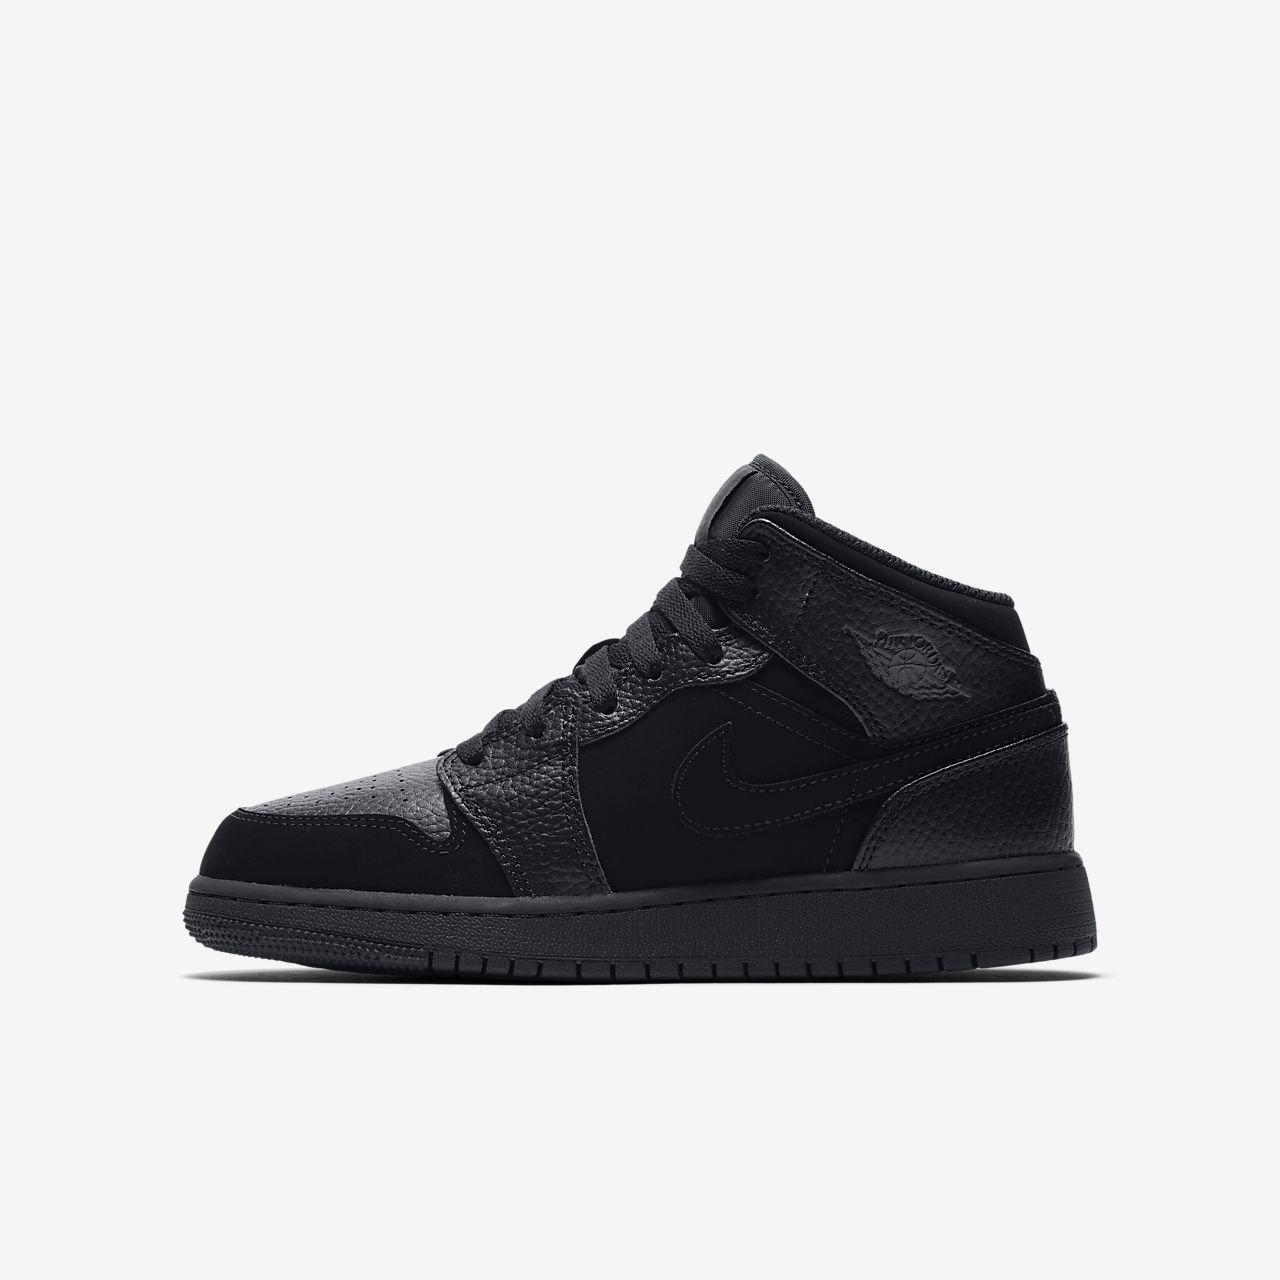 a57883075122 Air Jordan 1 Mid Older Kids  Shoe. Nike.com NZ